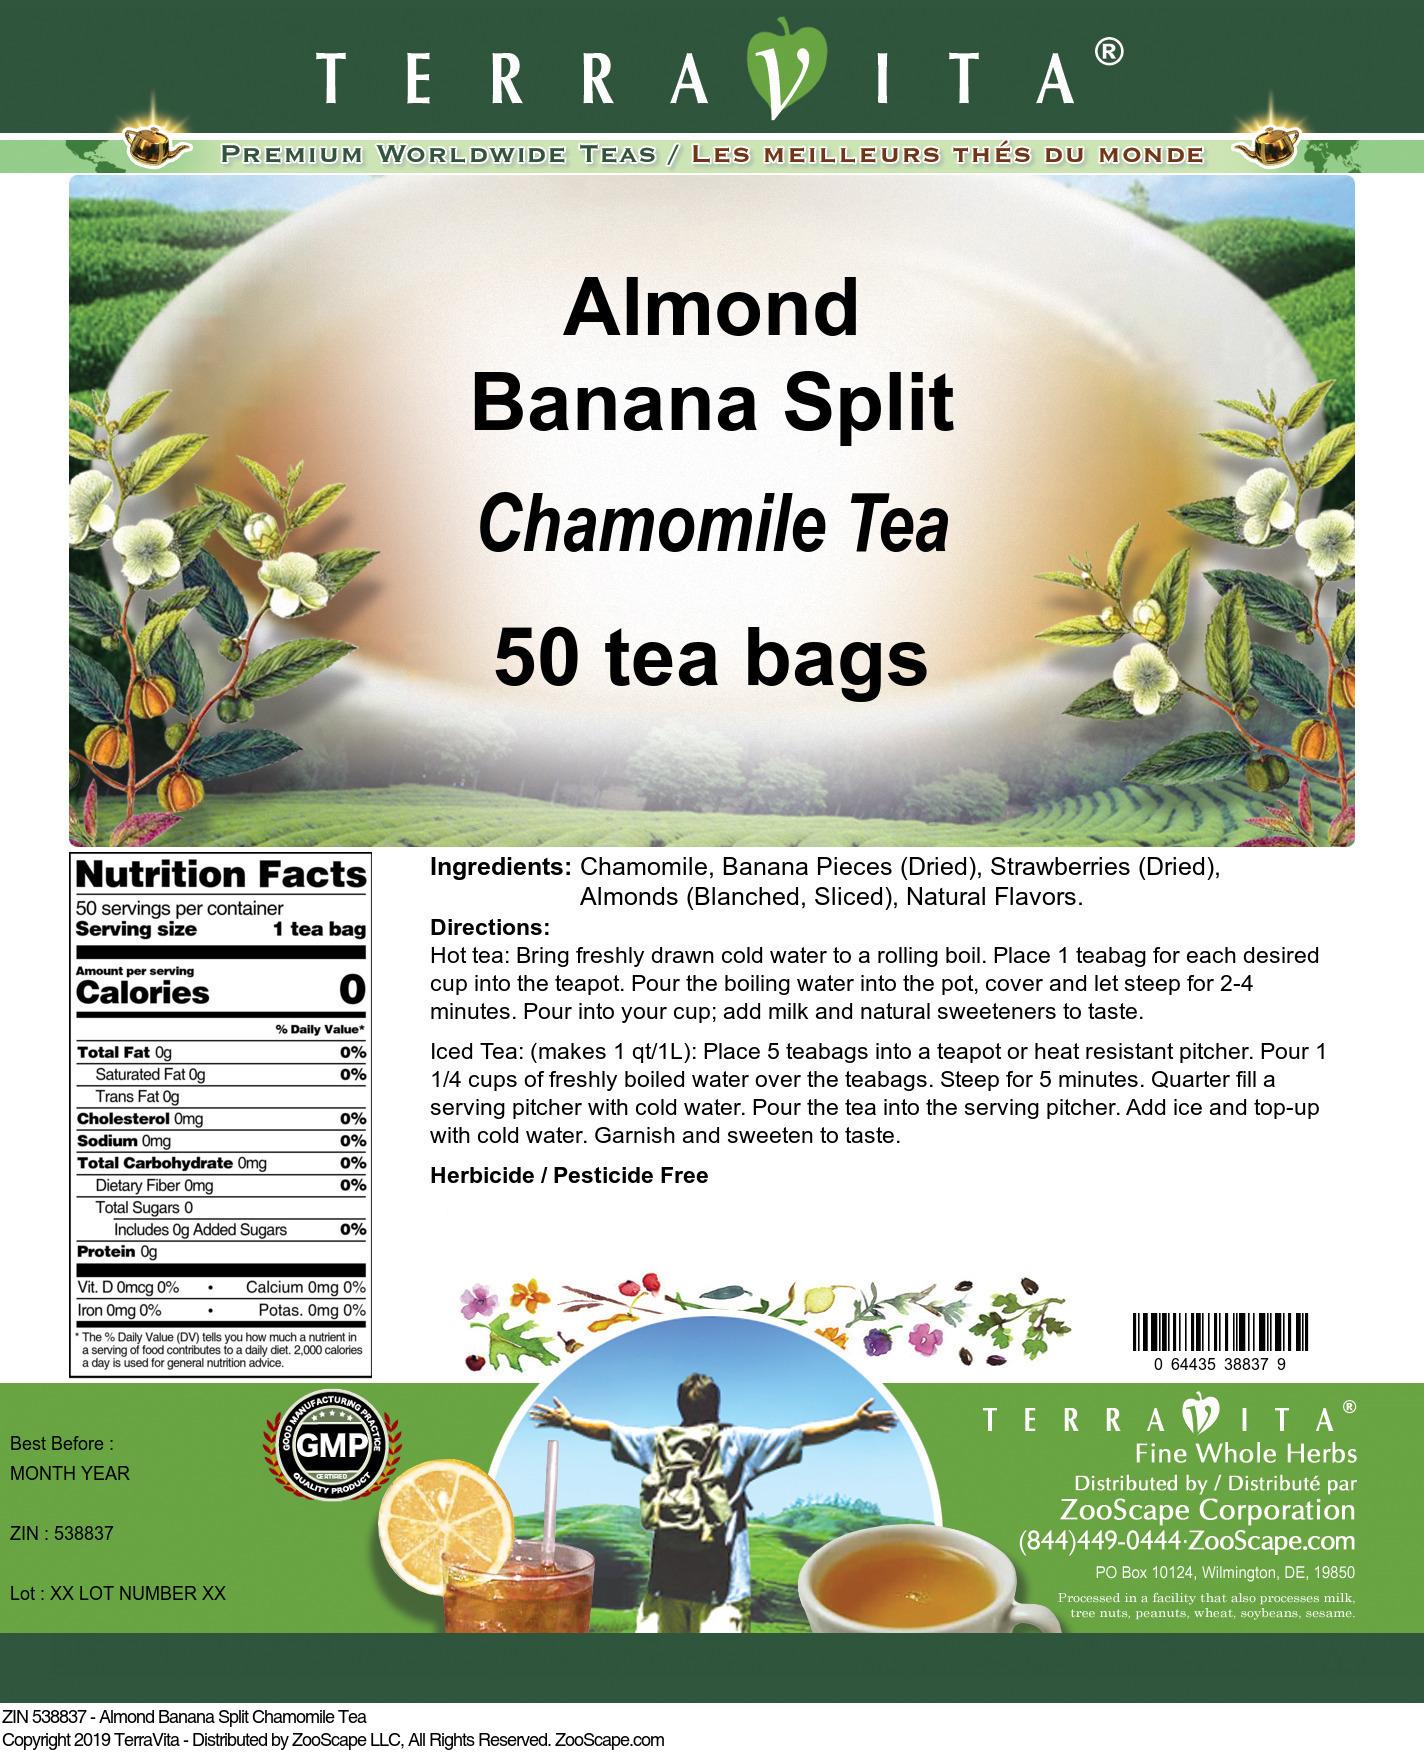 Almond Banana Split Chamomile Tea